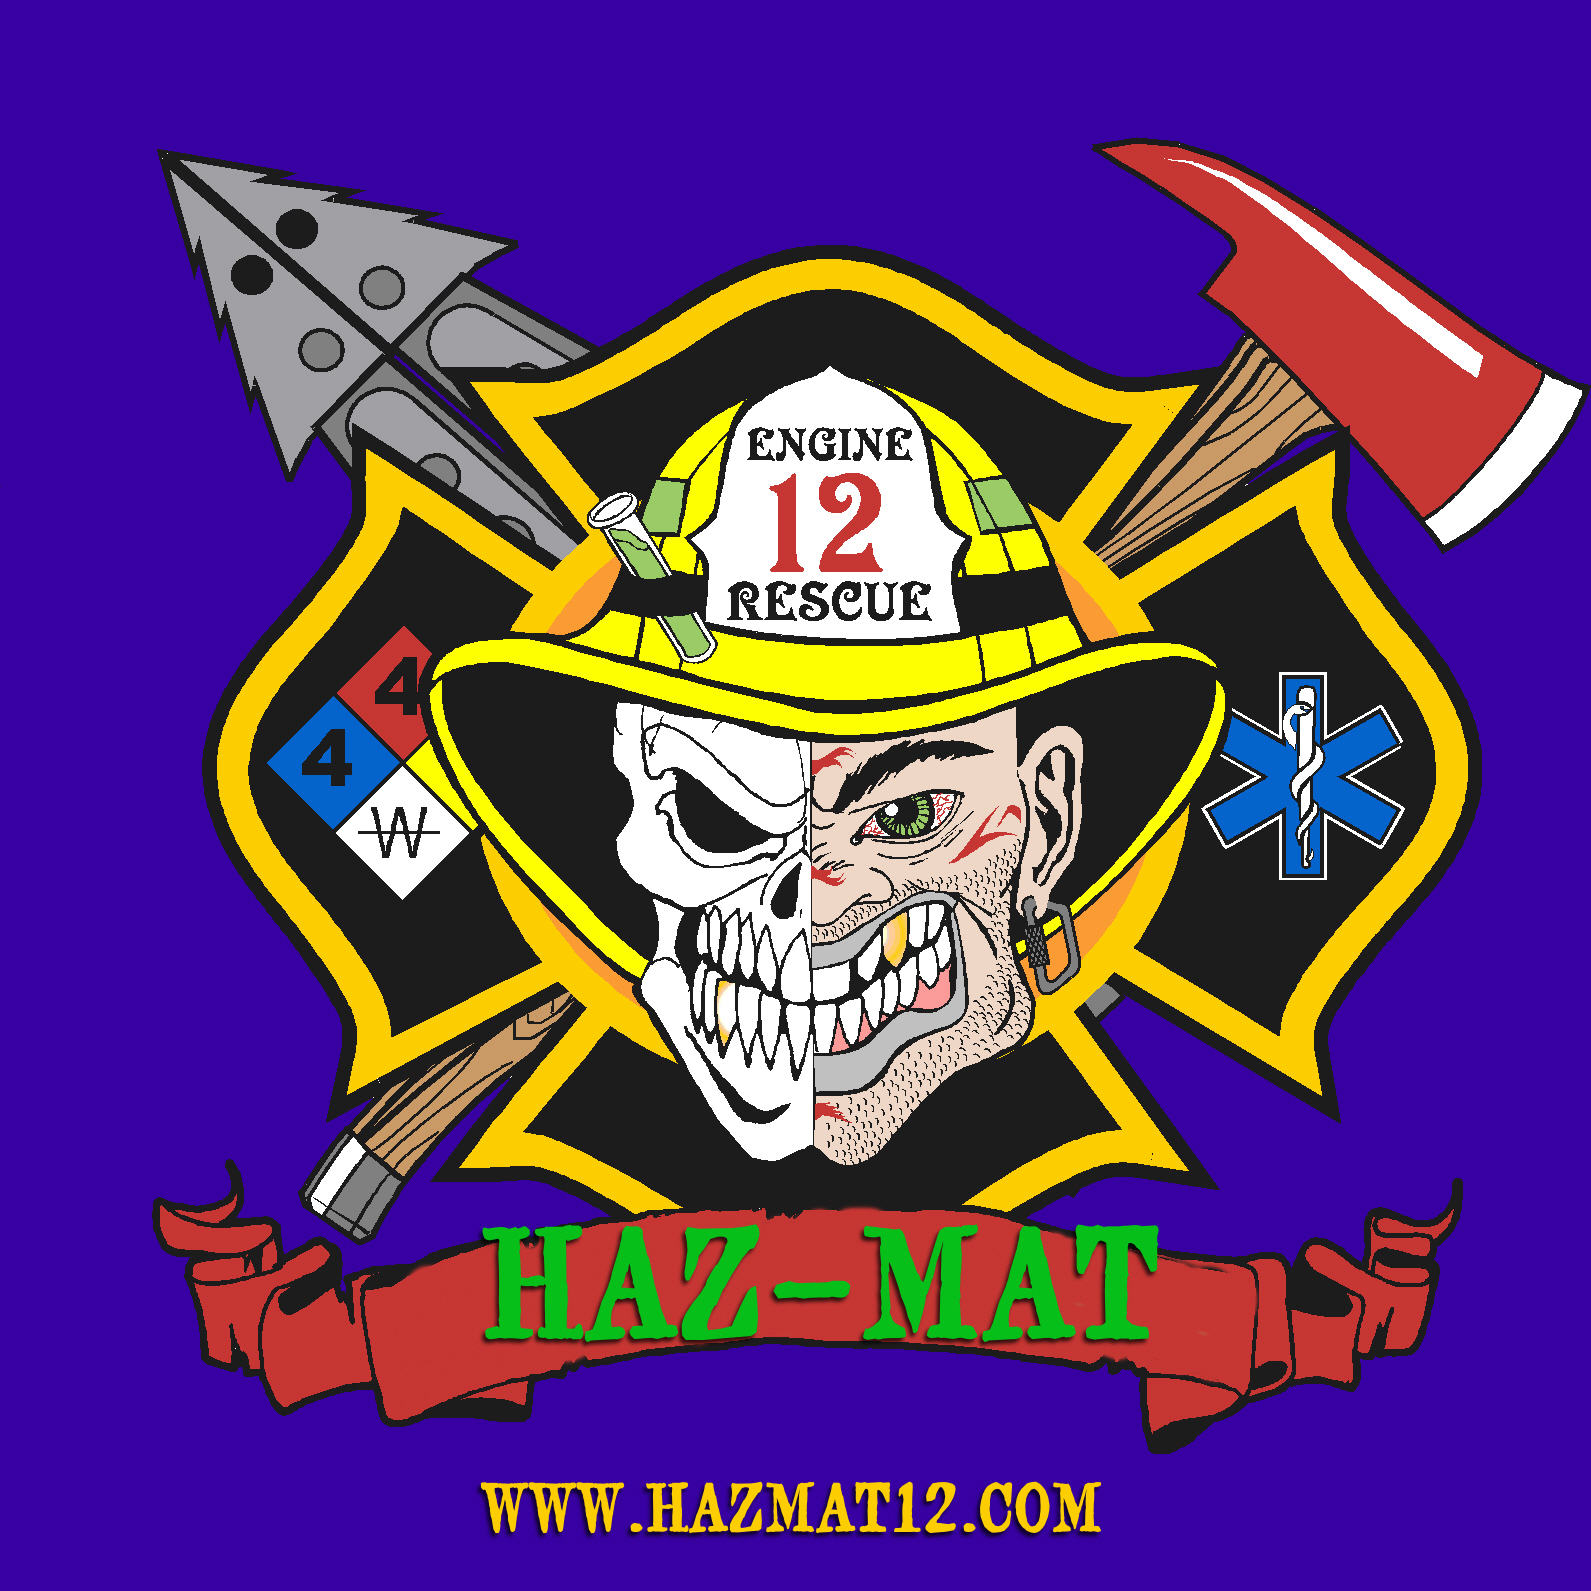 Free Hazmat Cliparts, Download Free Clip Art, Free Clip Art on.